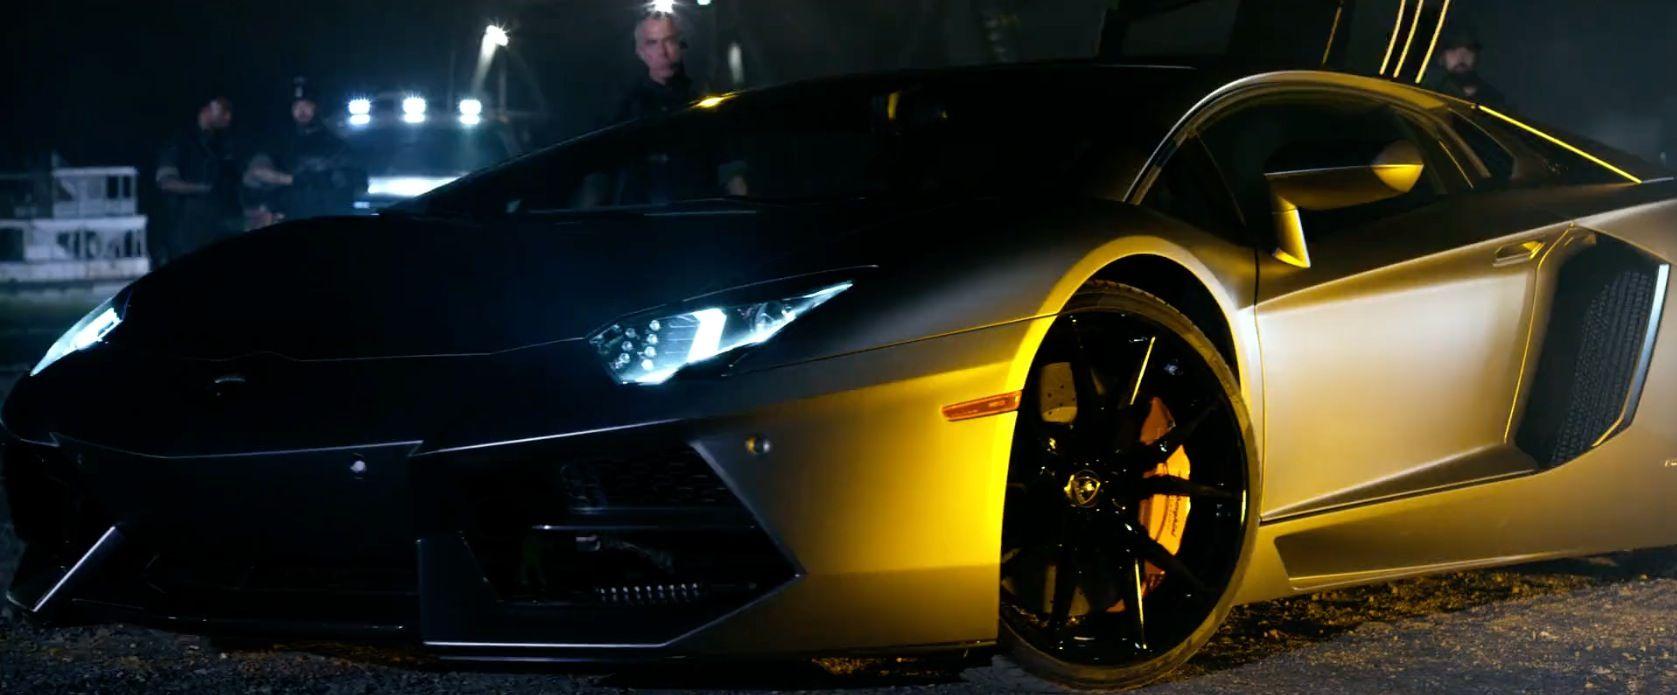 Lamborghini Aventador Lp 700 4 2012 Car In Transformers Age Of Extinction 2014 Lamborghini Transformers Age Of Extinction Lamborghini